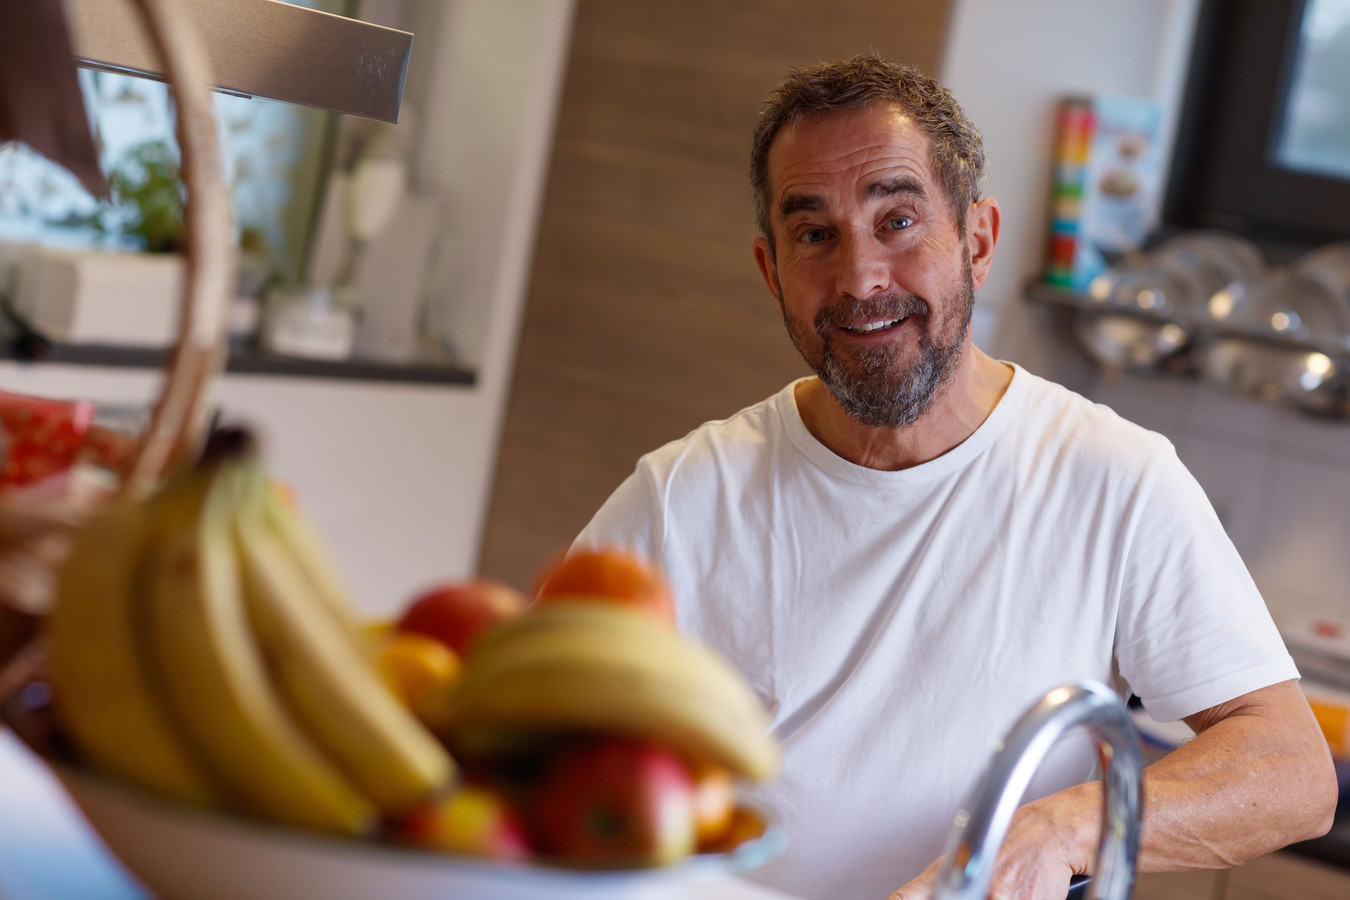 Marc Steinmann kookt als vrijwilliger in het hospice